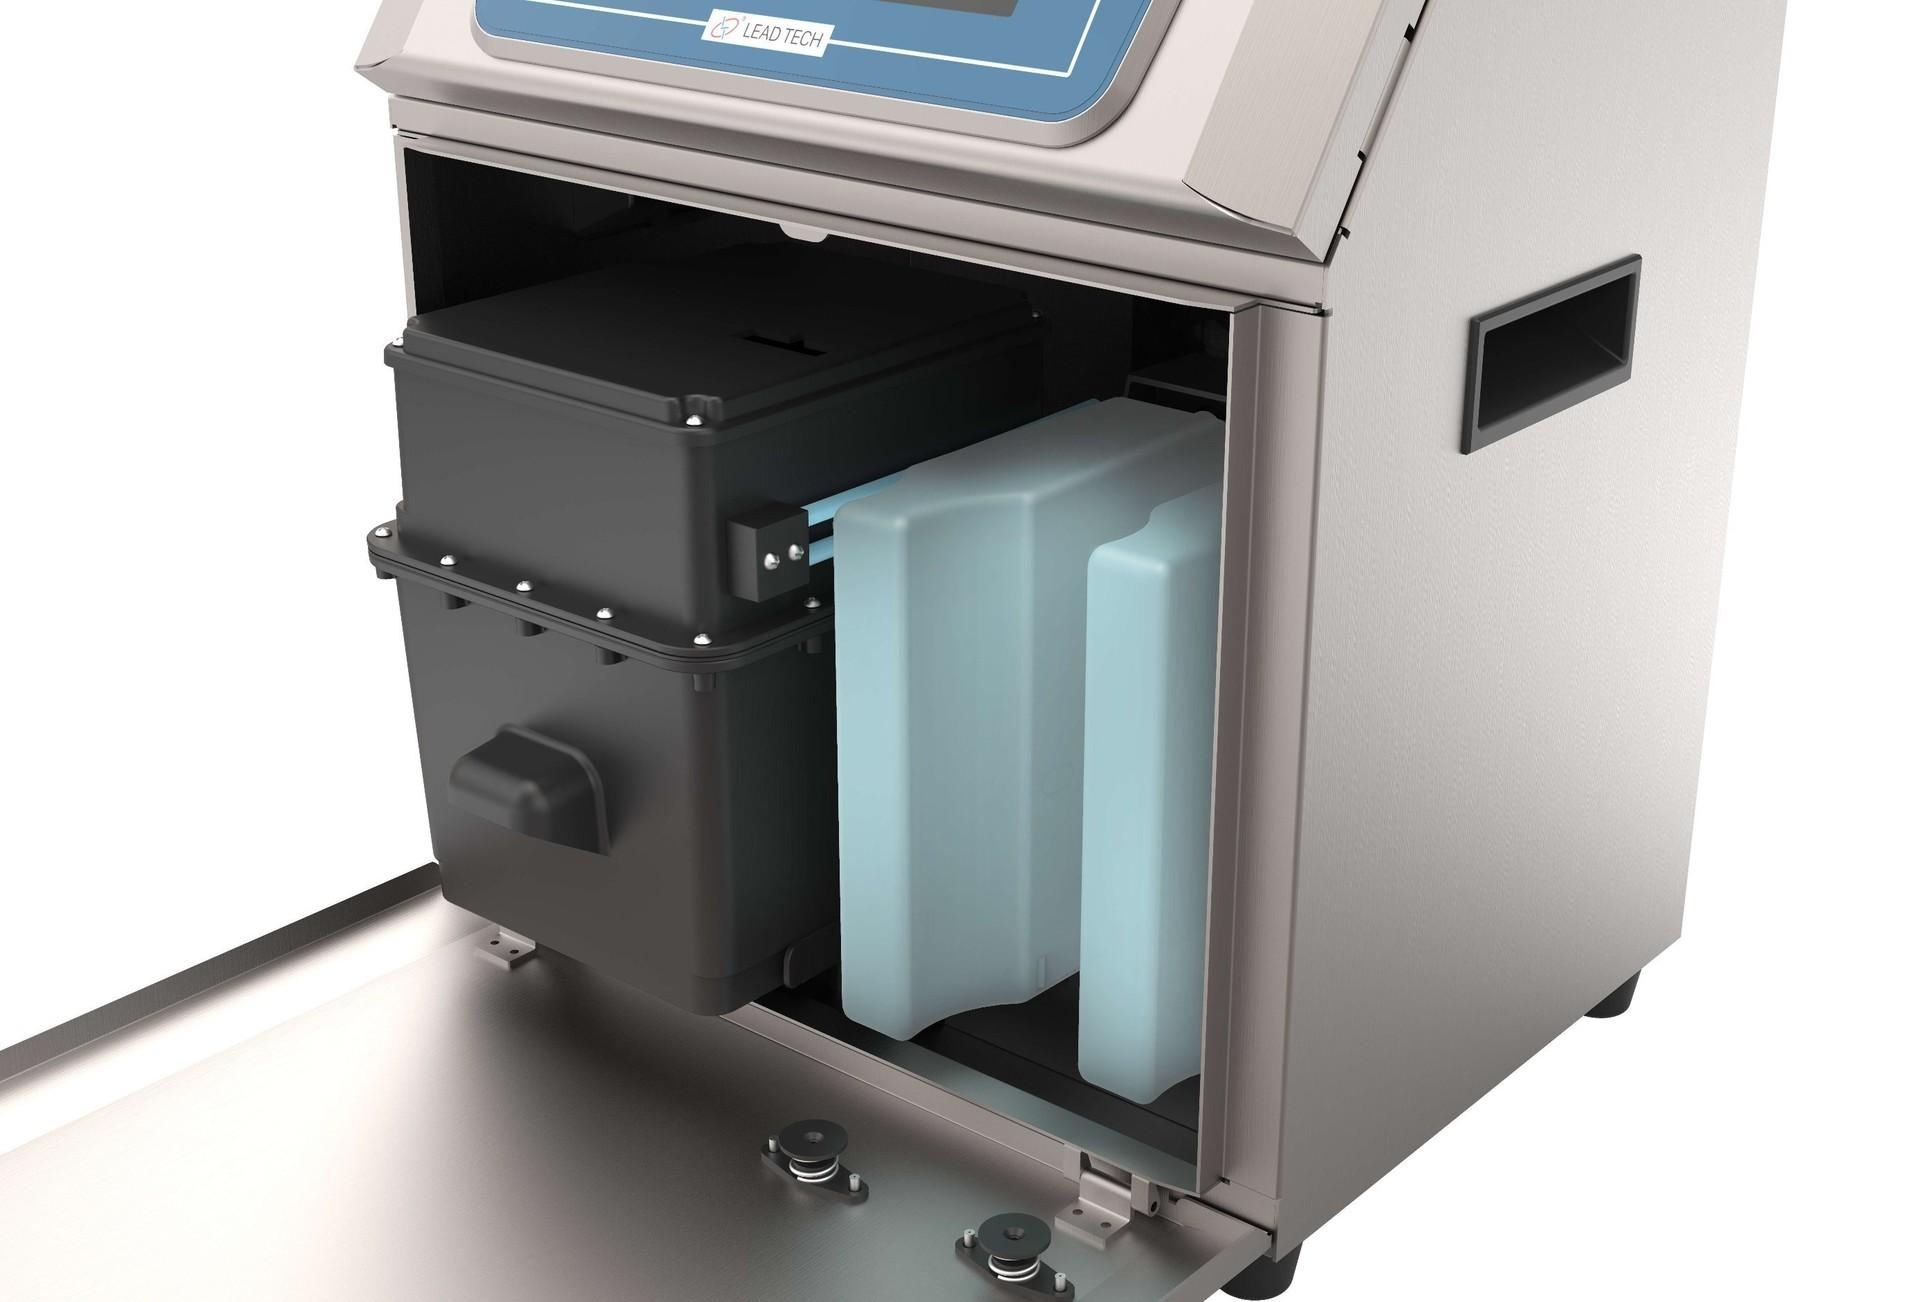 Lead Tech Lt800 Pigment Cij Printer for Dark Cables